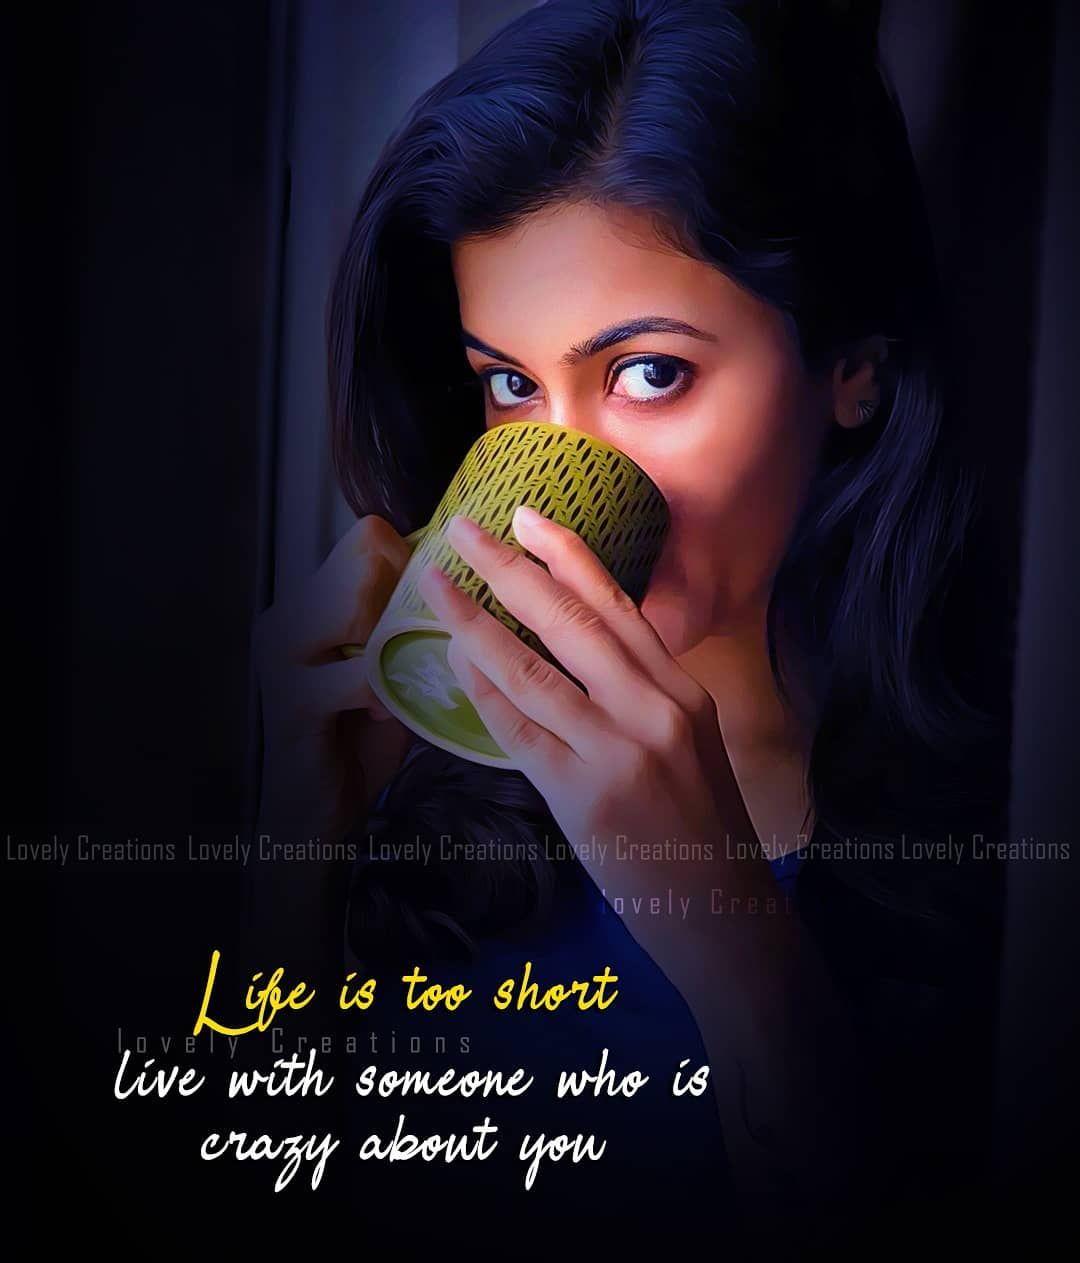 Follow Lovely Creations Editz Follow Lovely Creations Editz Tamil Tamily Kolly Kol Love Quotes With Images Movie Love Quotes Tamil Movie Love Quotes